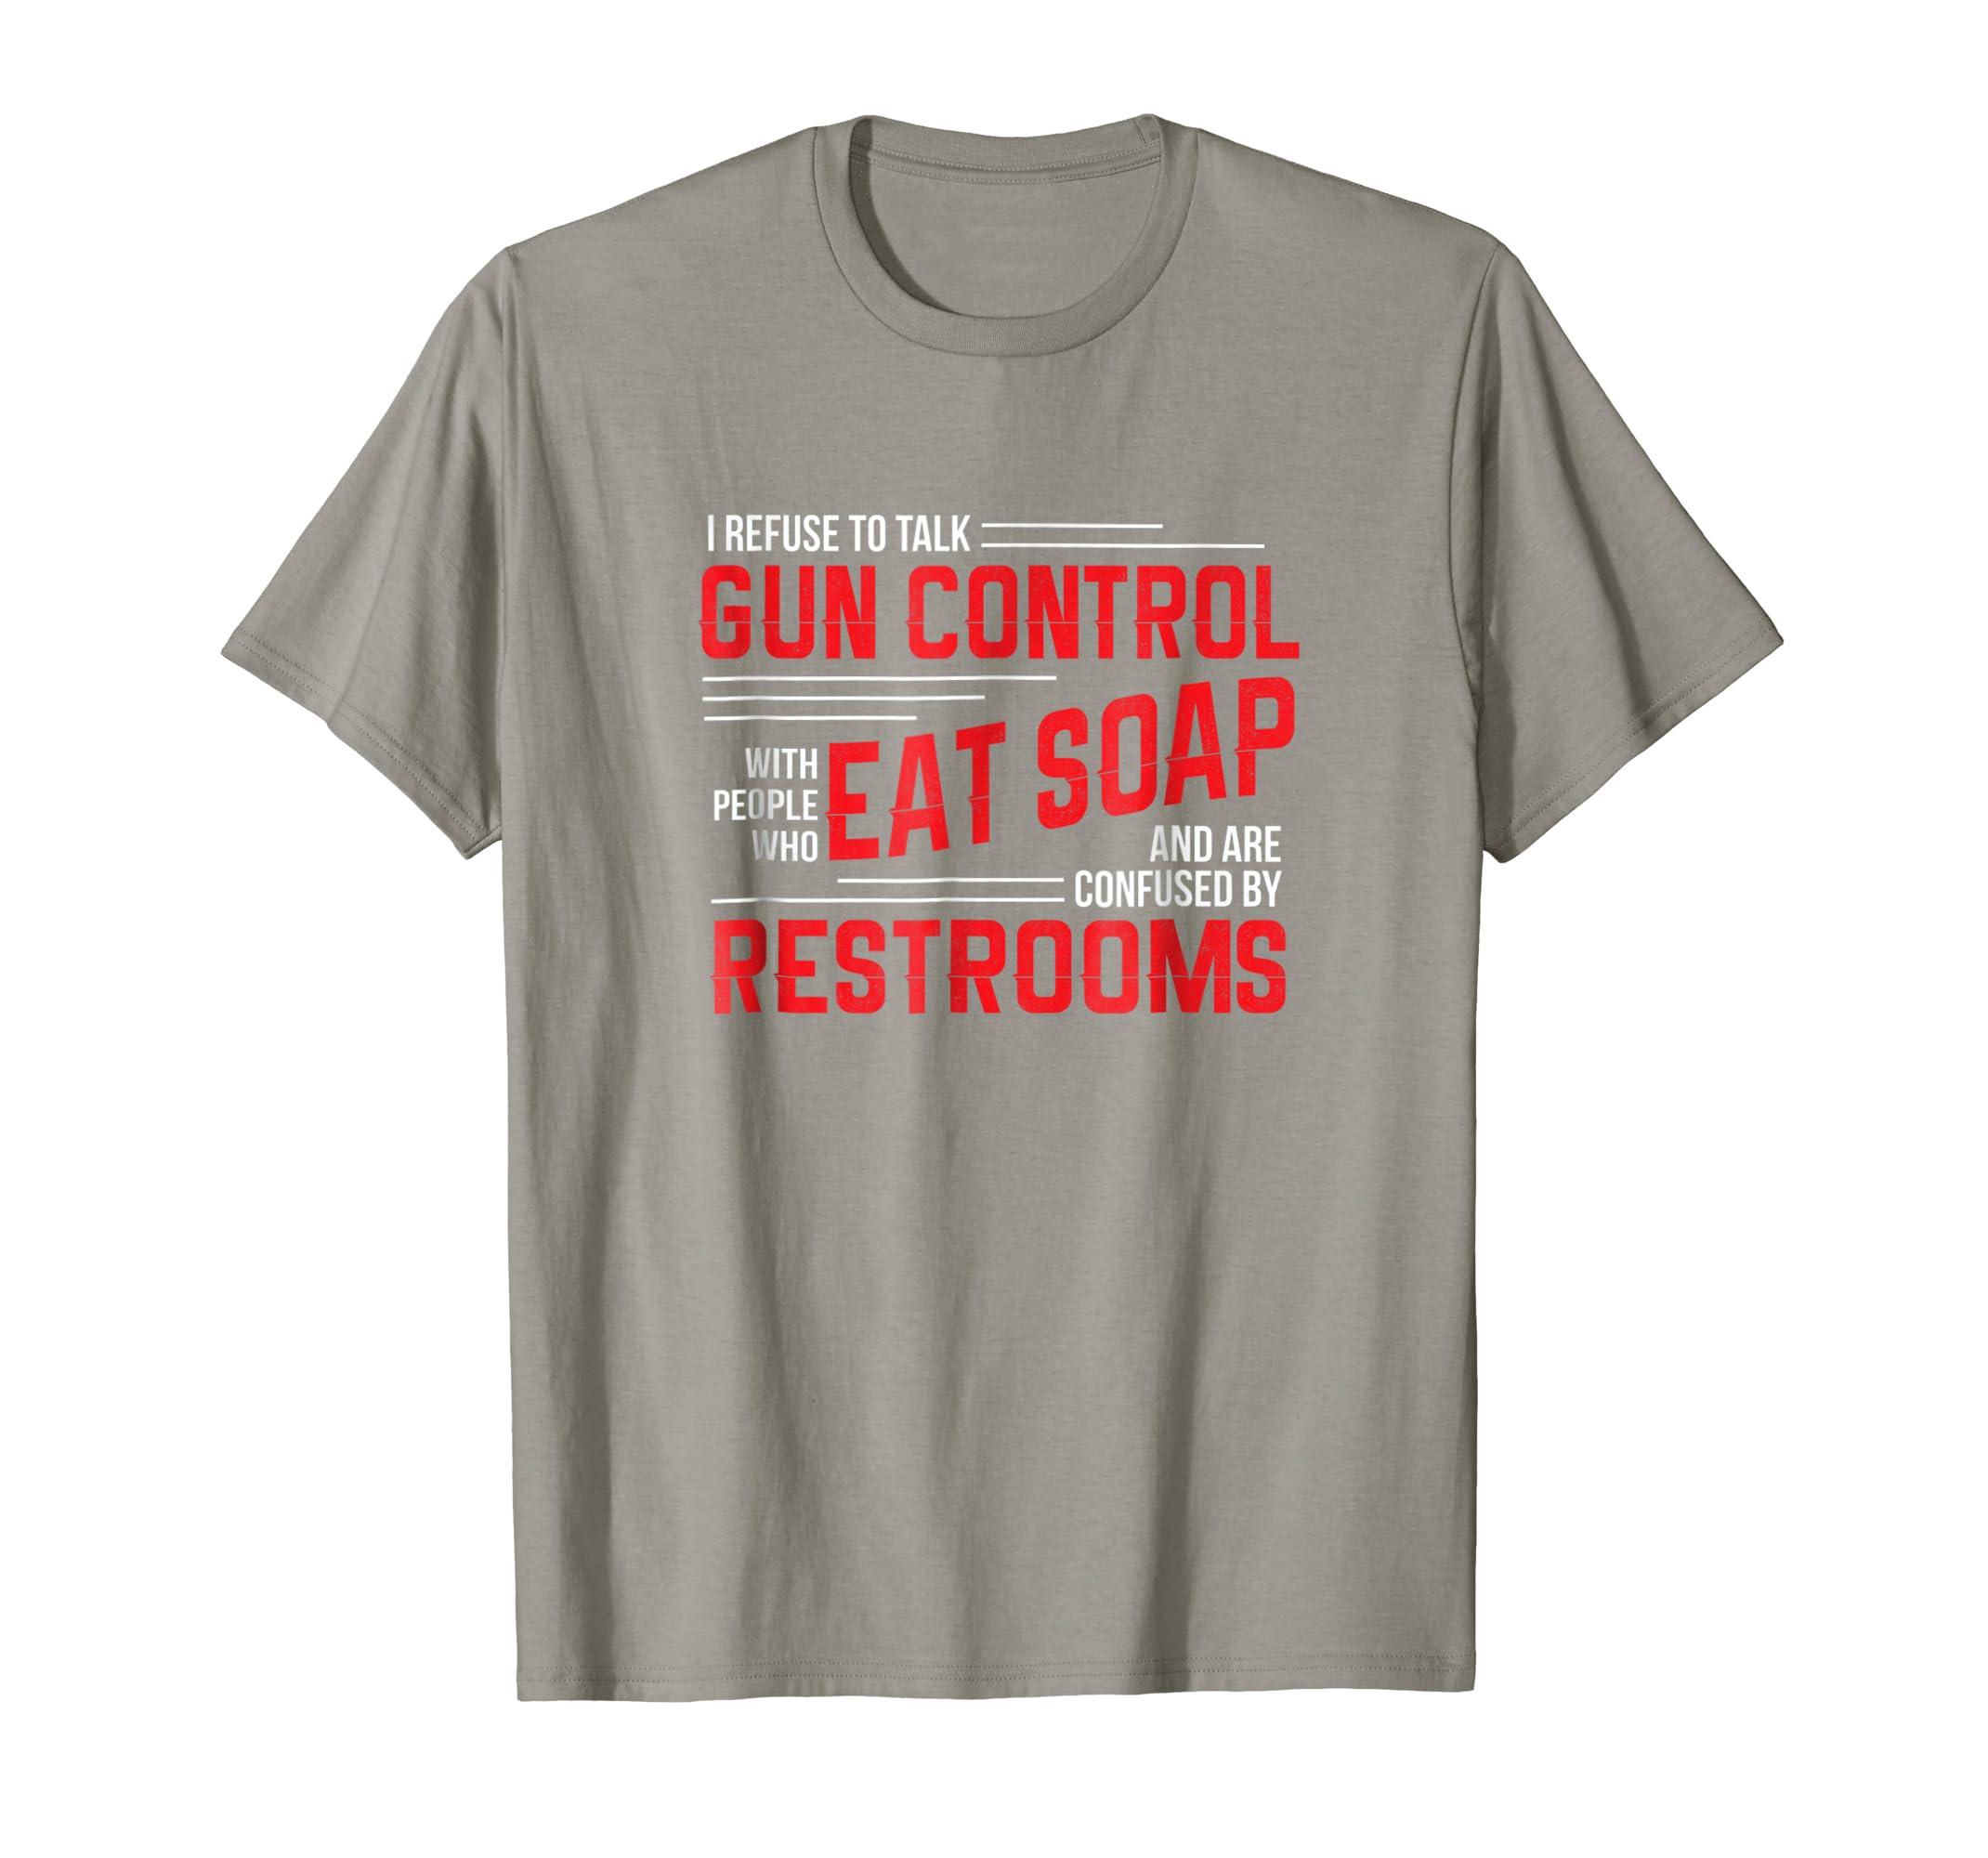 0cb1a85c4 Amazon.com: Gun Control T Shirt Gun Rights Pro Gun Debate 2nd Amendment:  Clothing